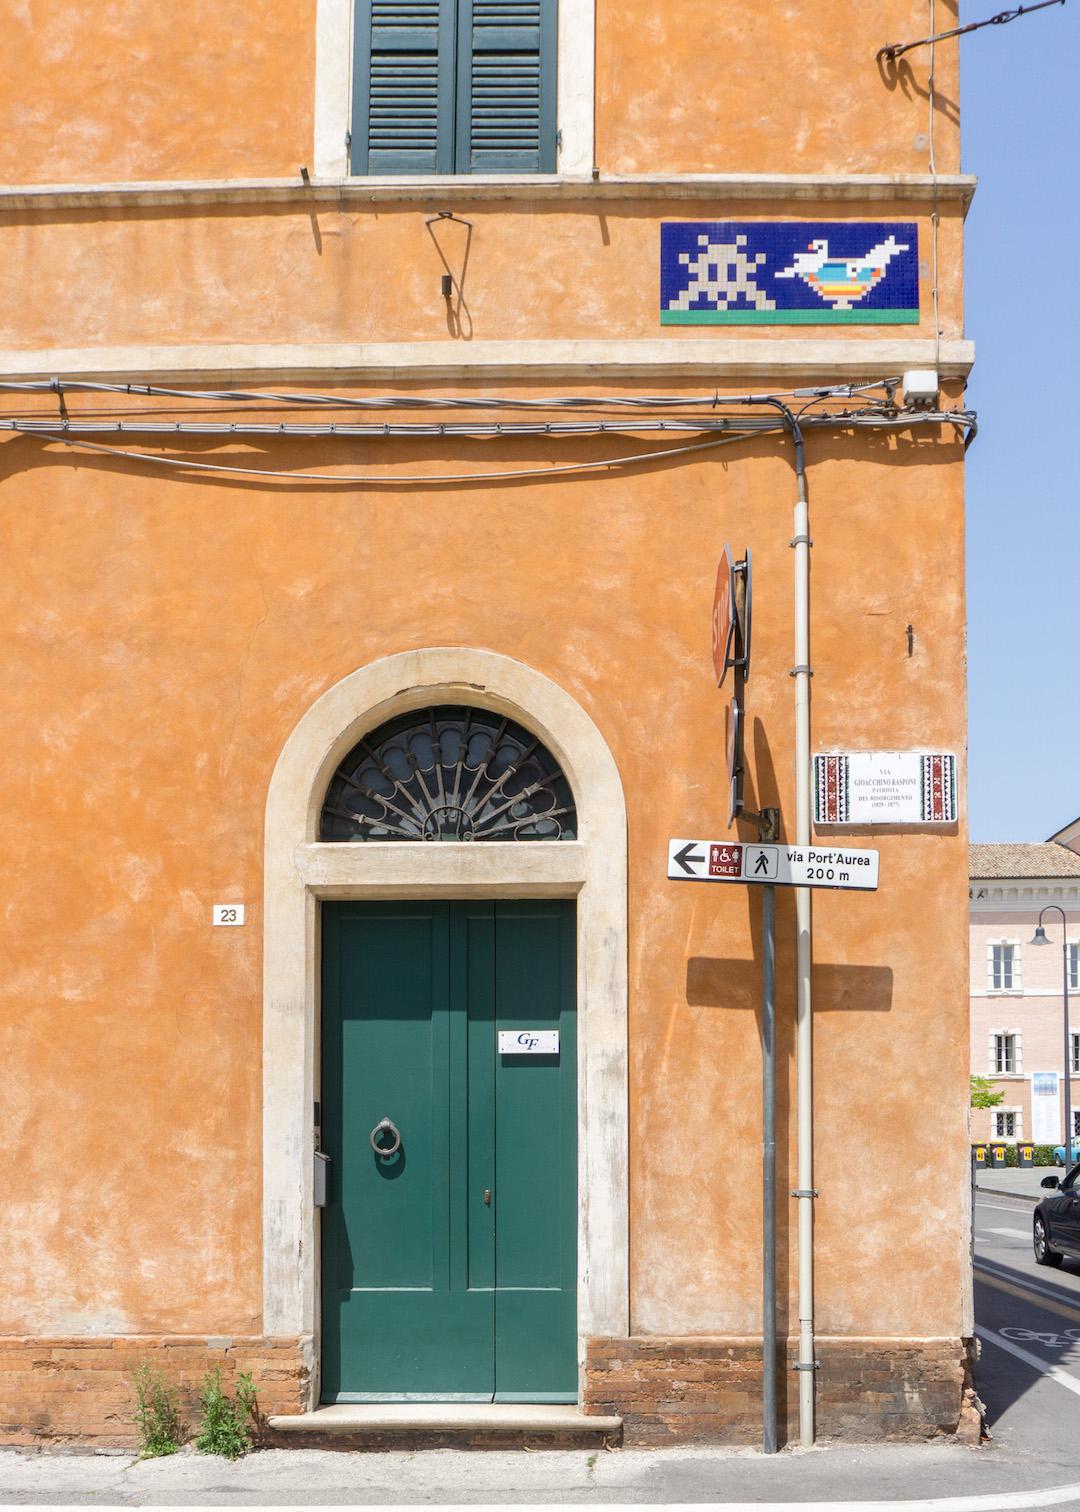 Her_Travel_Edit_Ravenna_Street_Sign